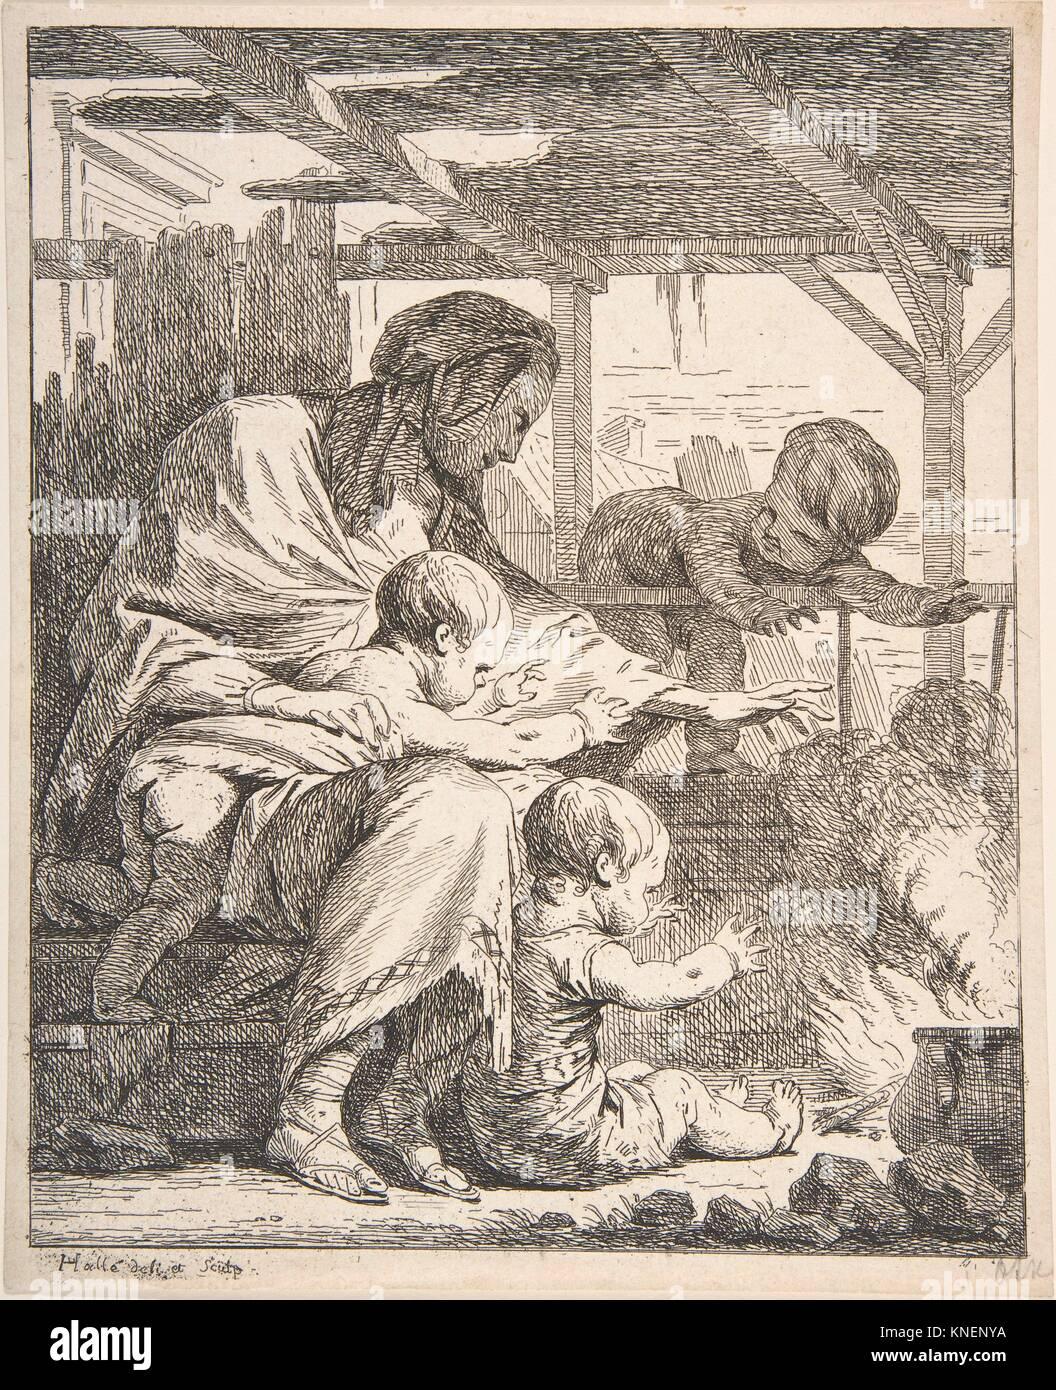 Family Warming Their Hands By a Fire. Artist: NoÃ«l Hallé (French, Paris 1711-1781 Paris); Date: - Stock Image